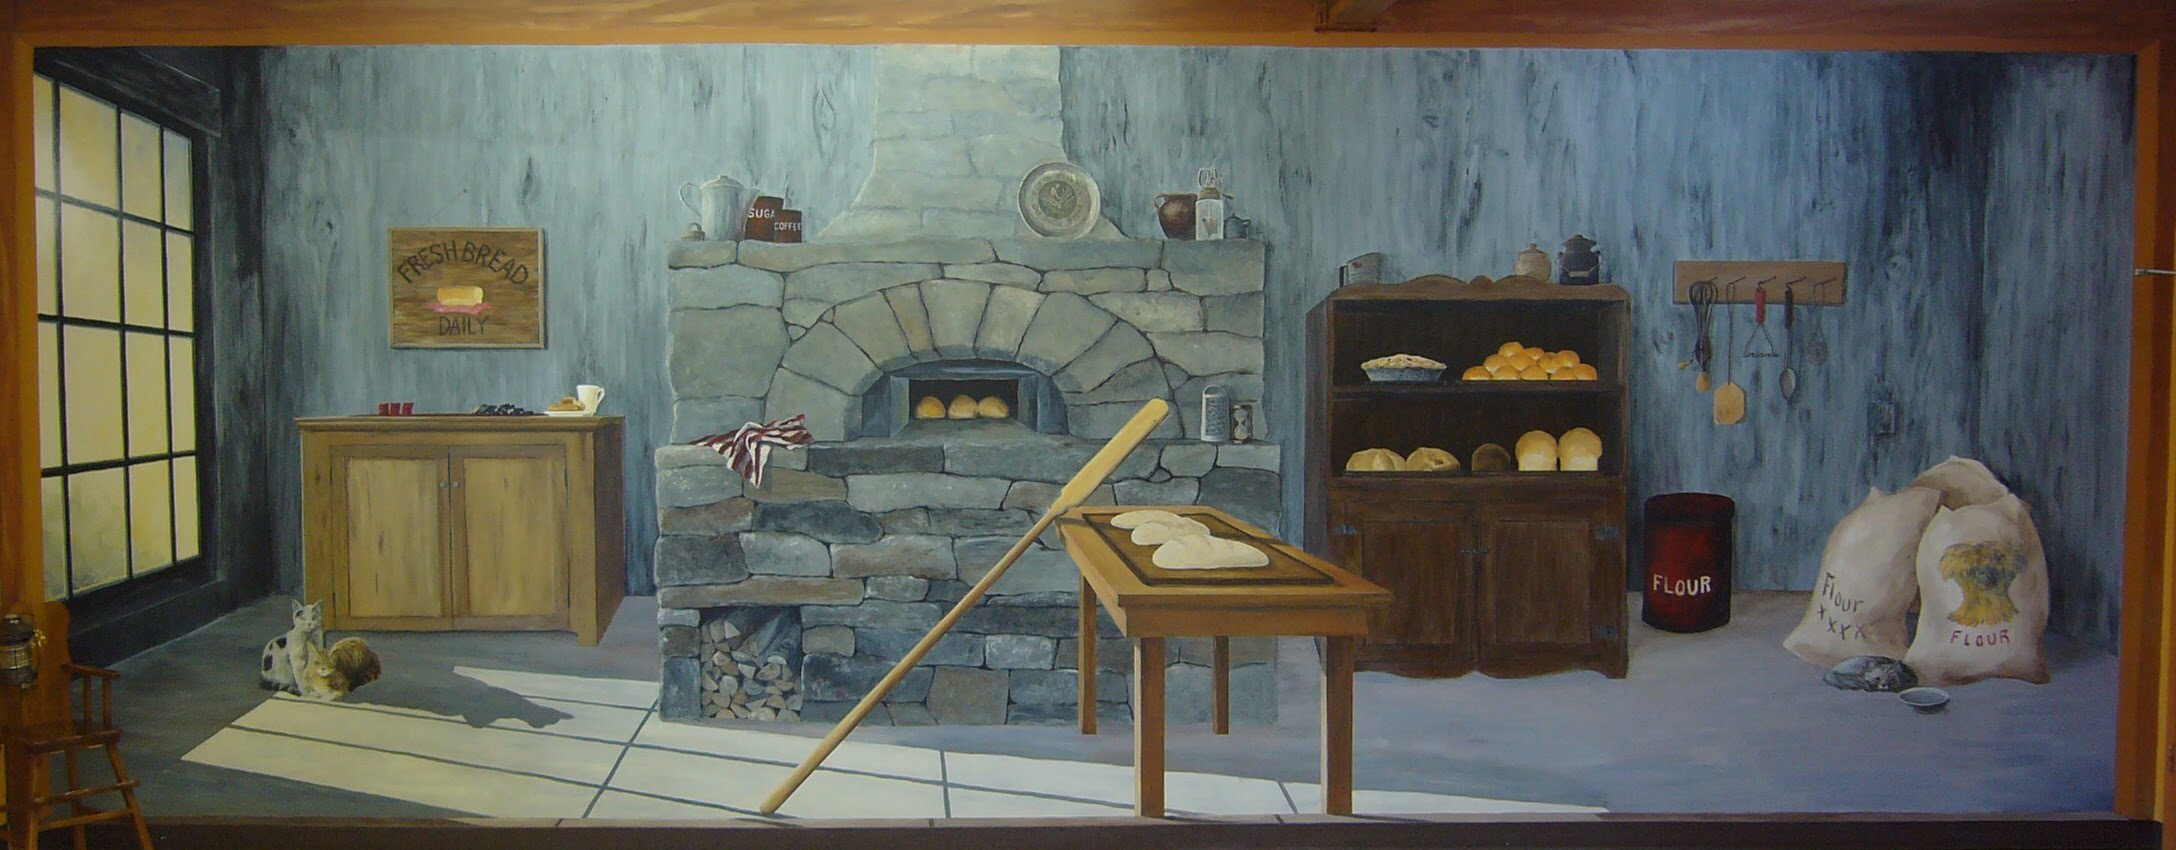 Completed Bakery Mural.jpg